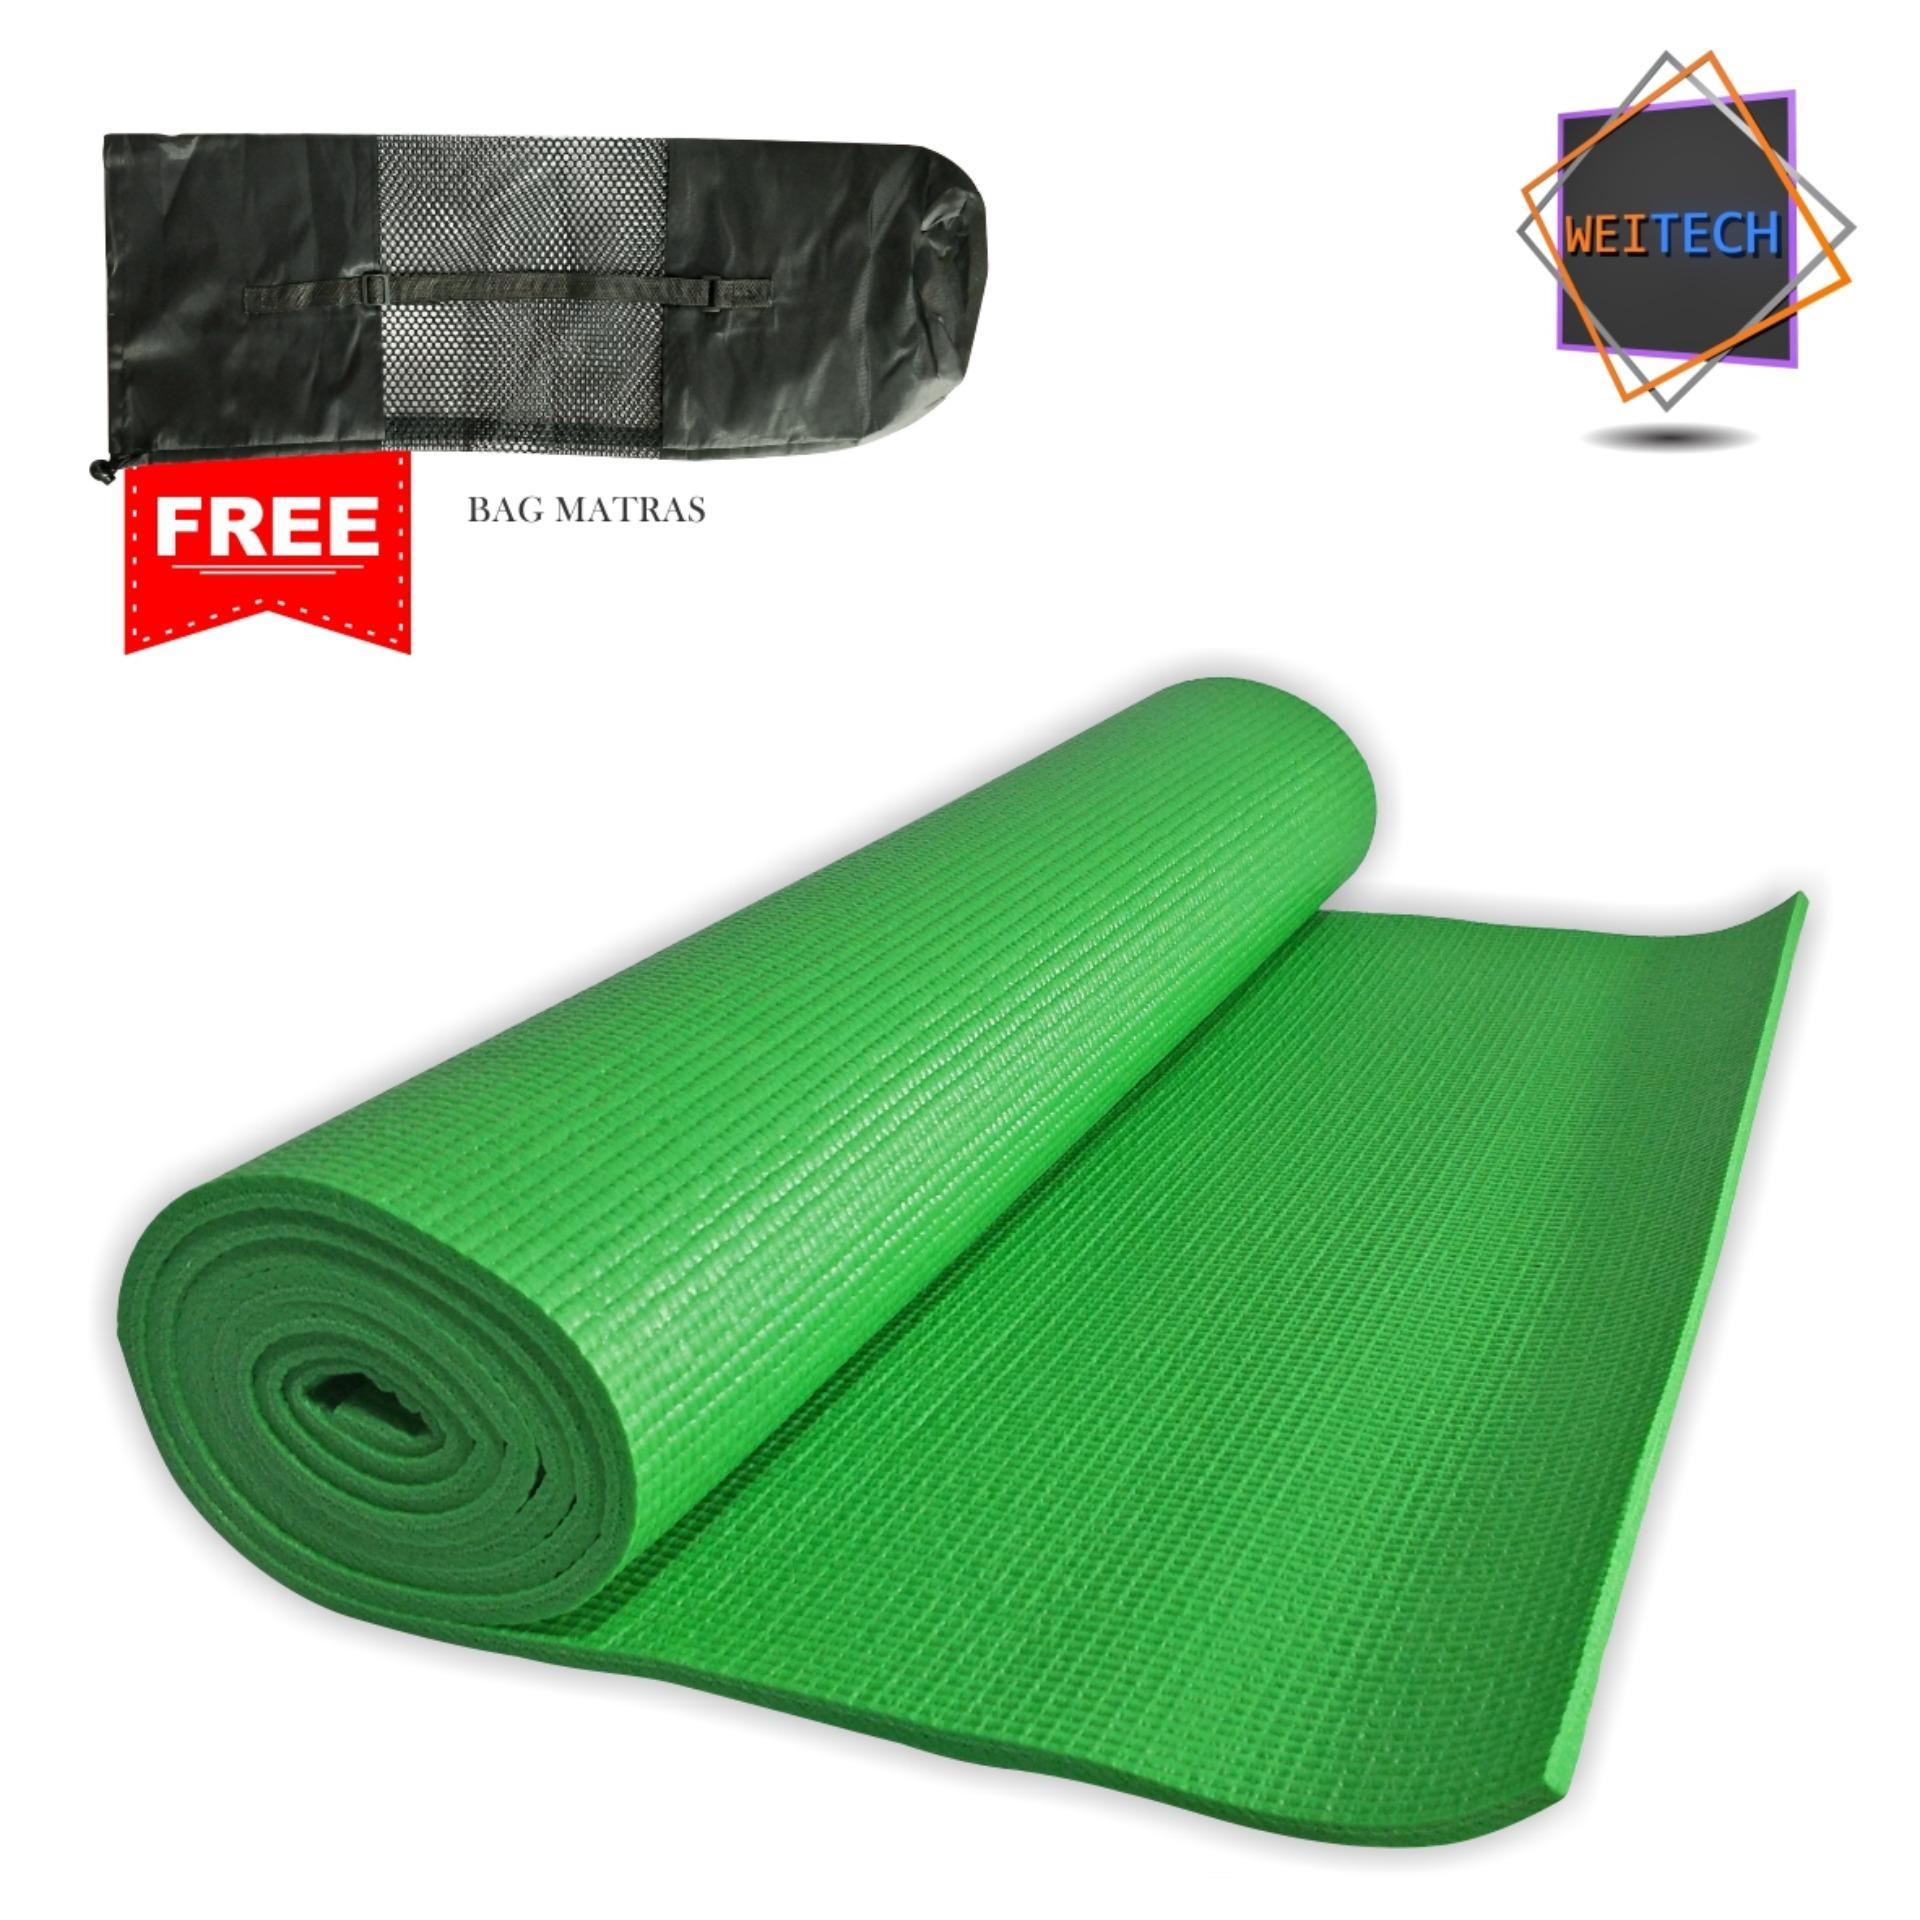 Spesifikasi Weitech Matras Yoga 8 Mm Free Tas Jaring 1001 Dan Harga